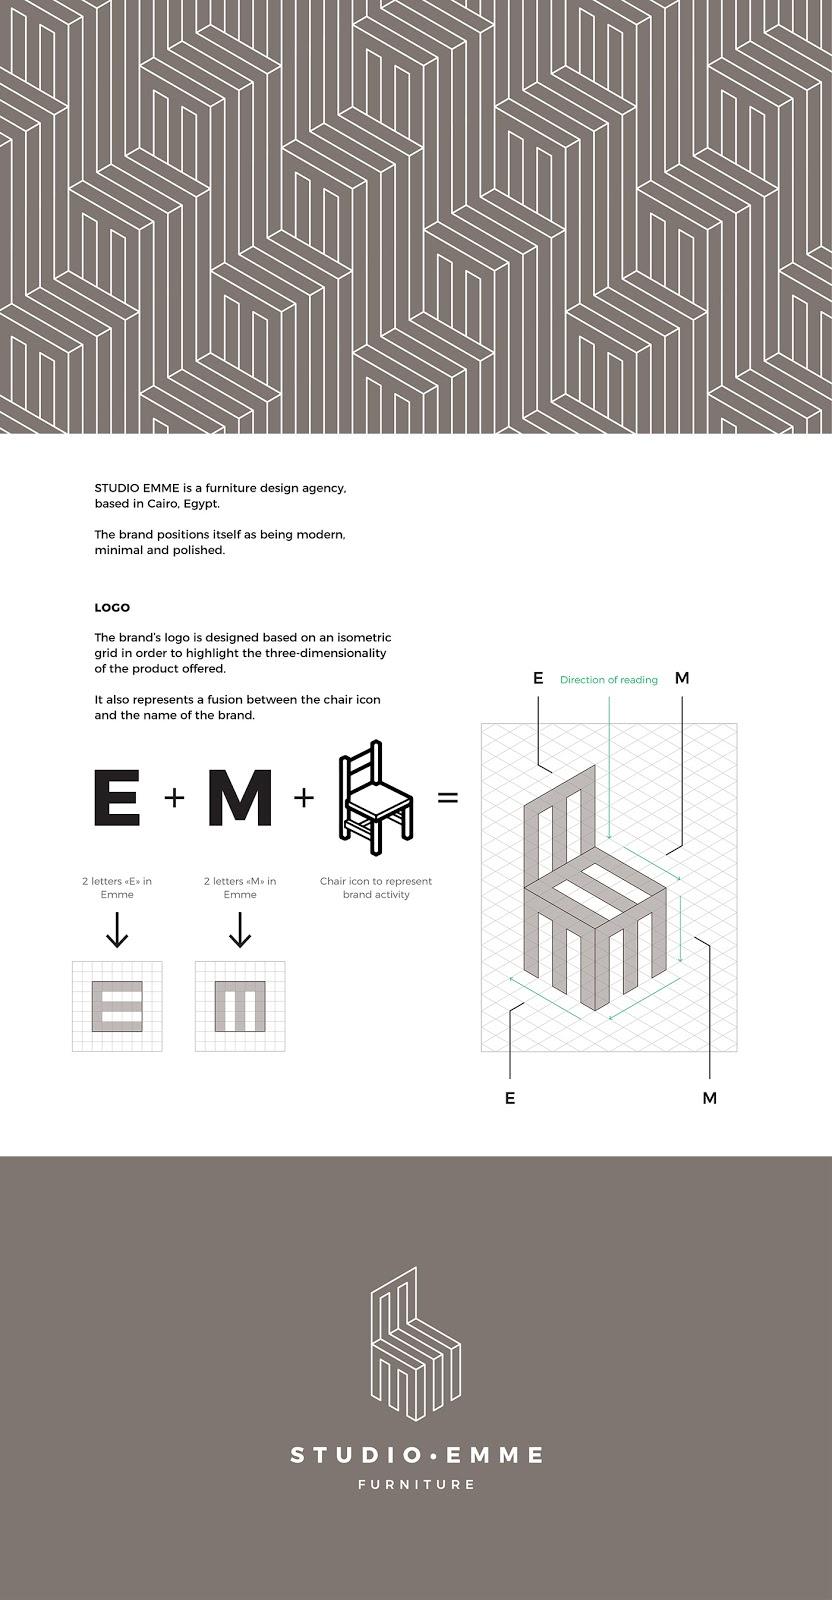 家具设计公司Studio Emme品牌形象设计